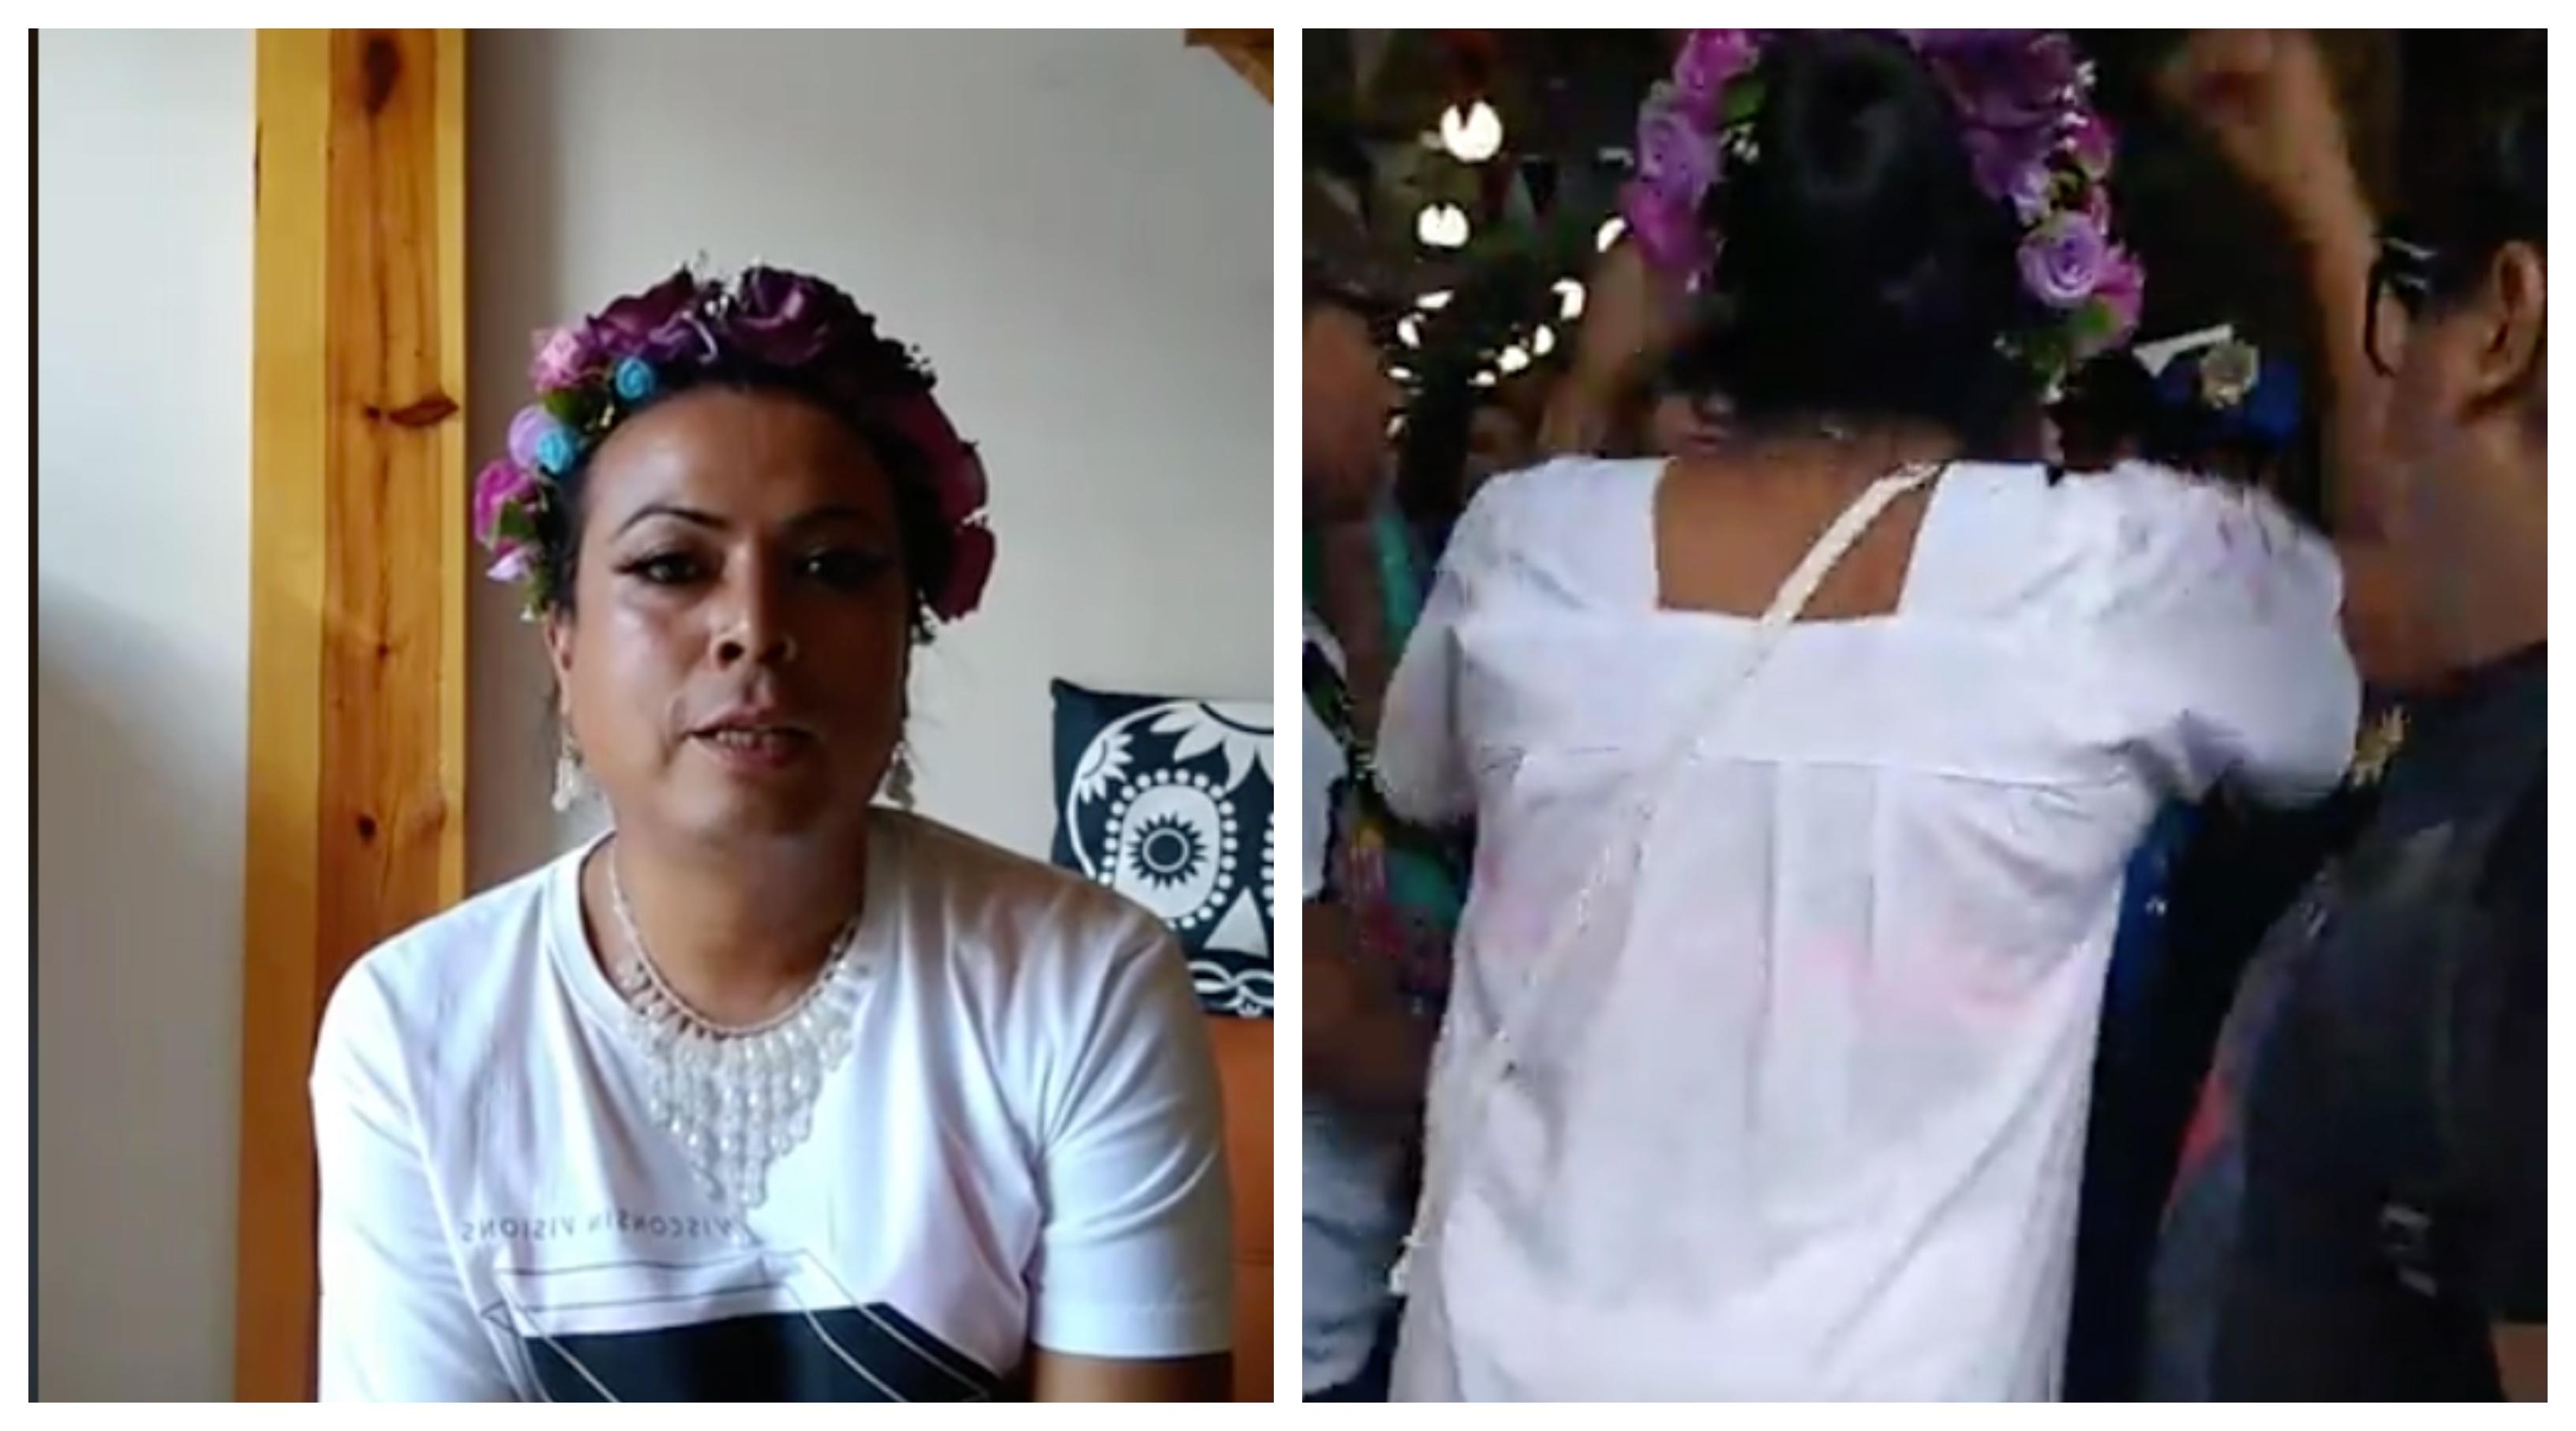 lady-tacos-vs-polis-pelea-por-la-canasta-mas-famosa-de-cdmx